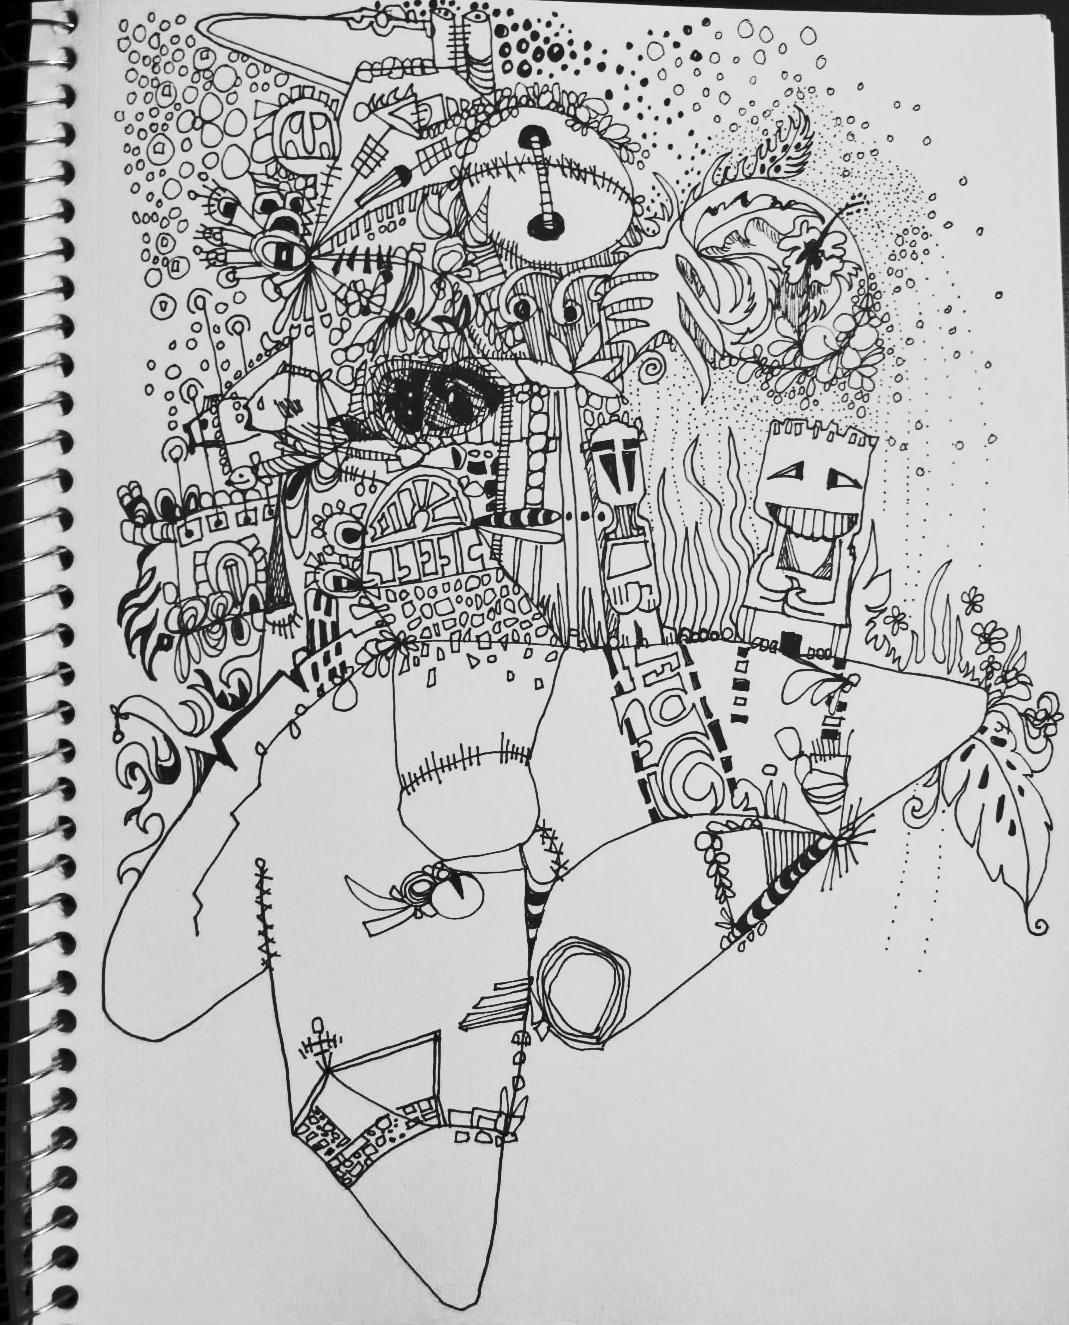 doodles on a plane u2026